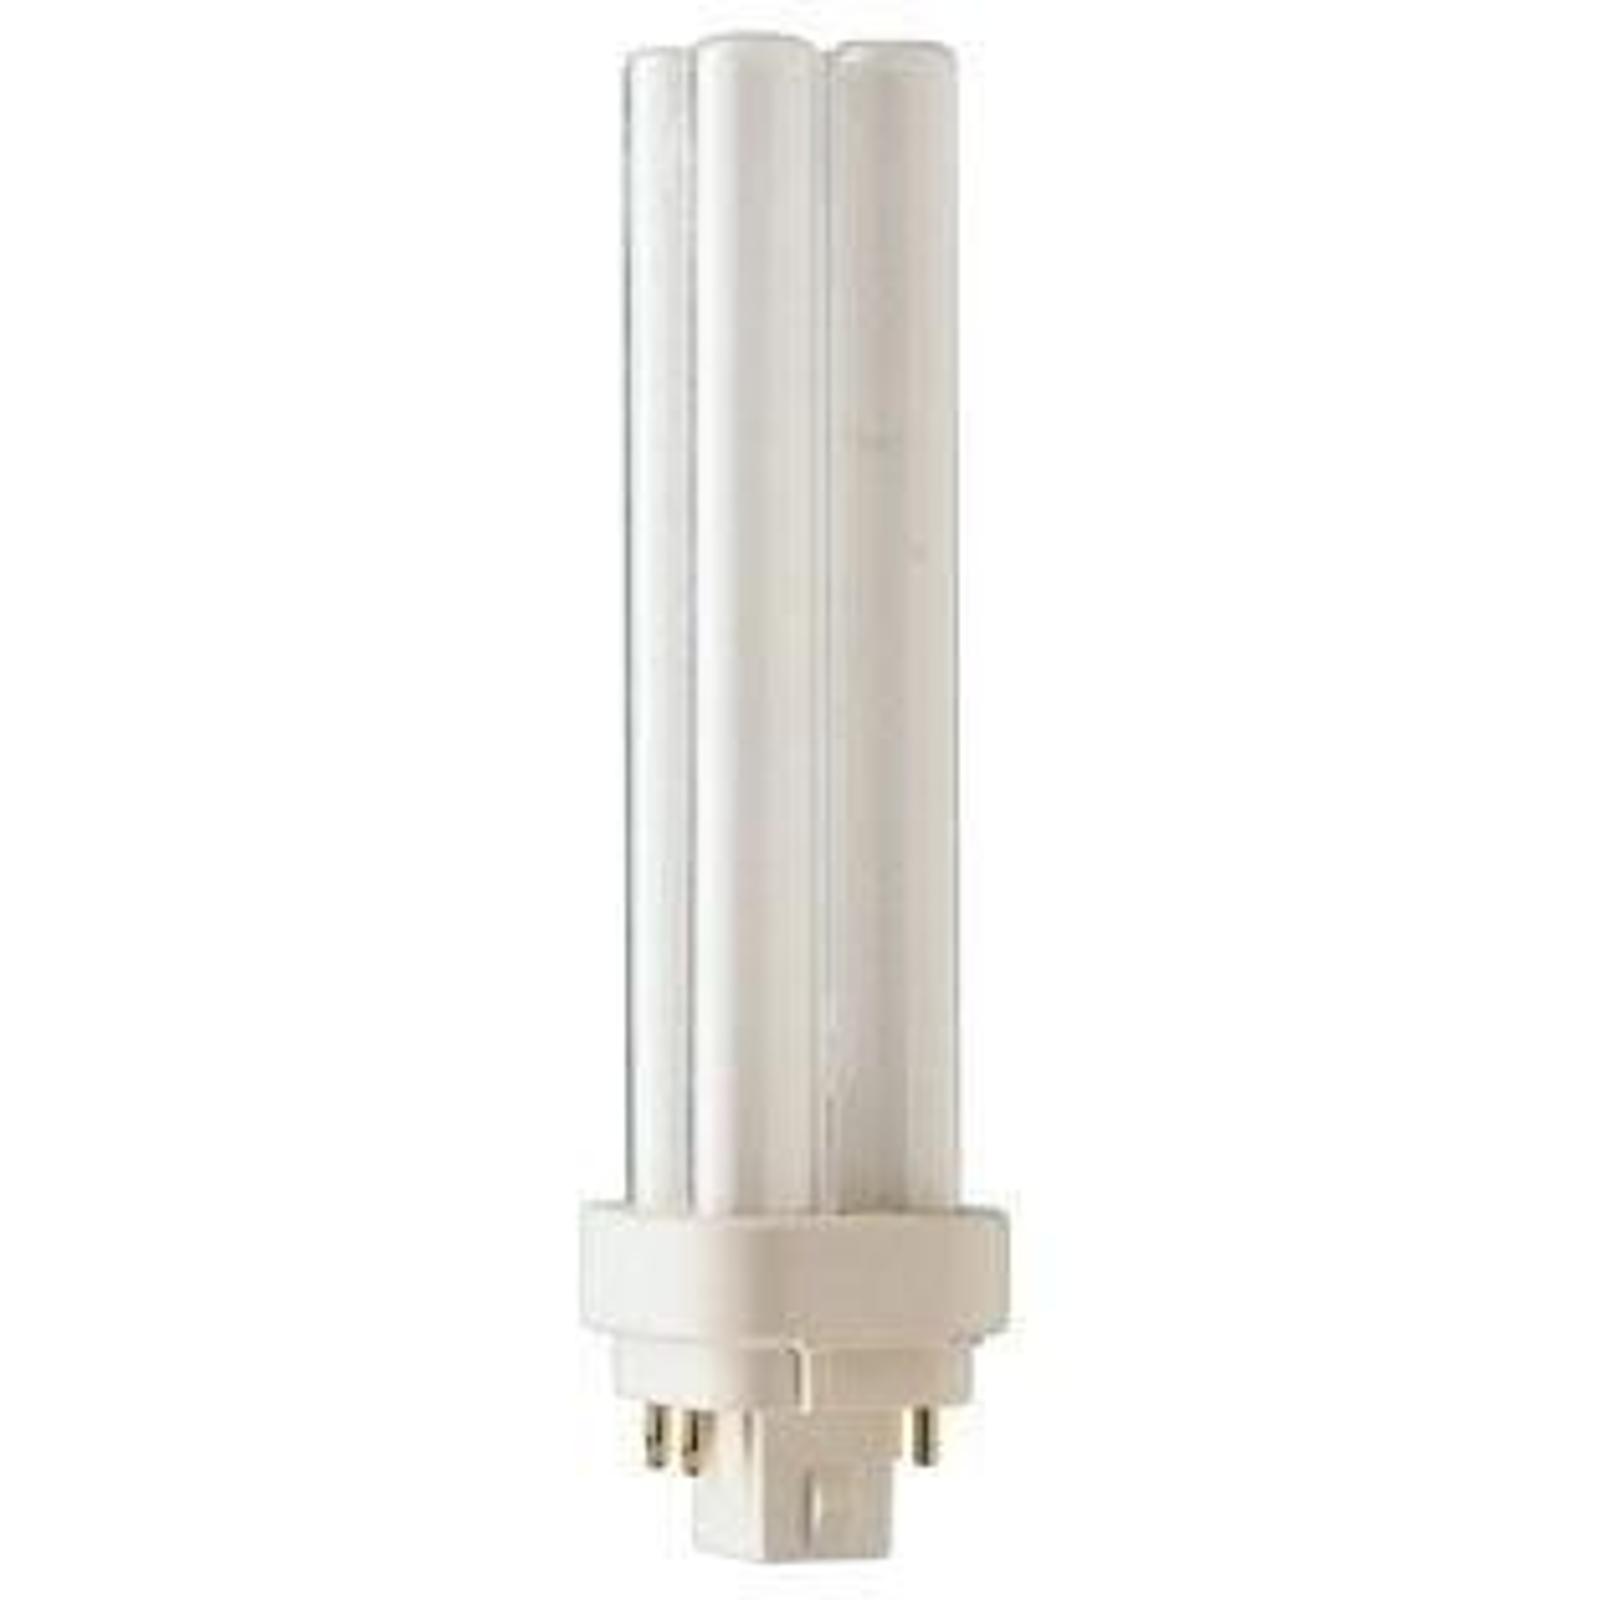 G24q 18W 840 kompakt lysstofrør Dulux D/E